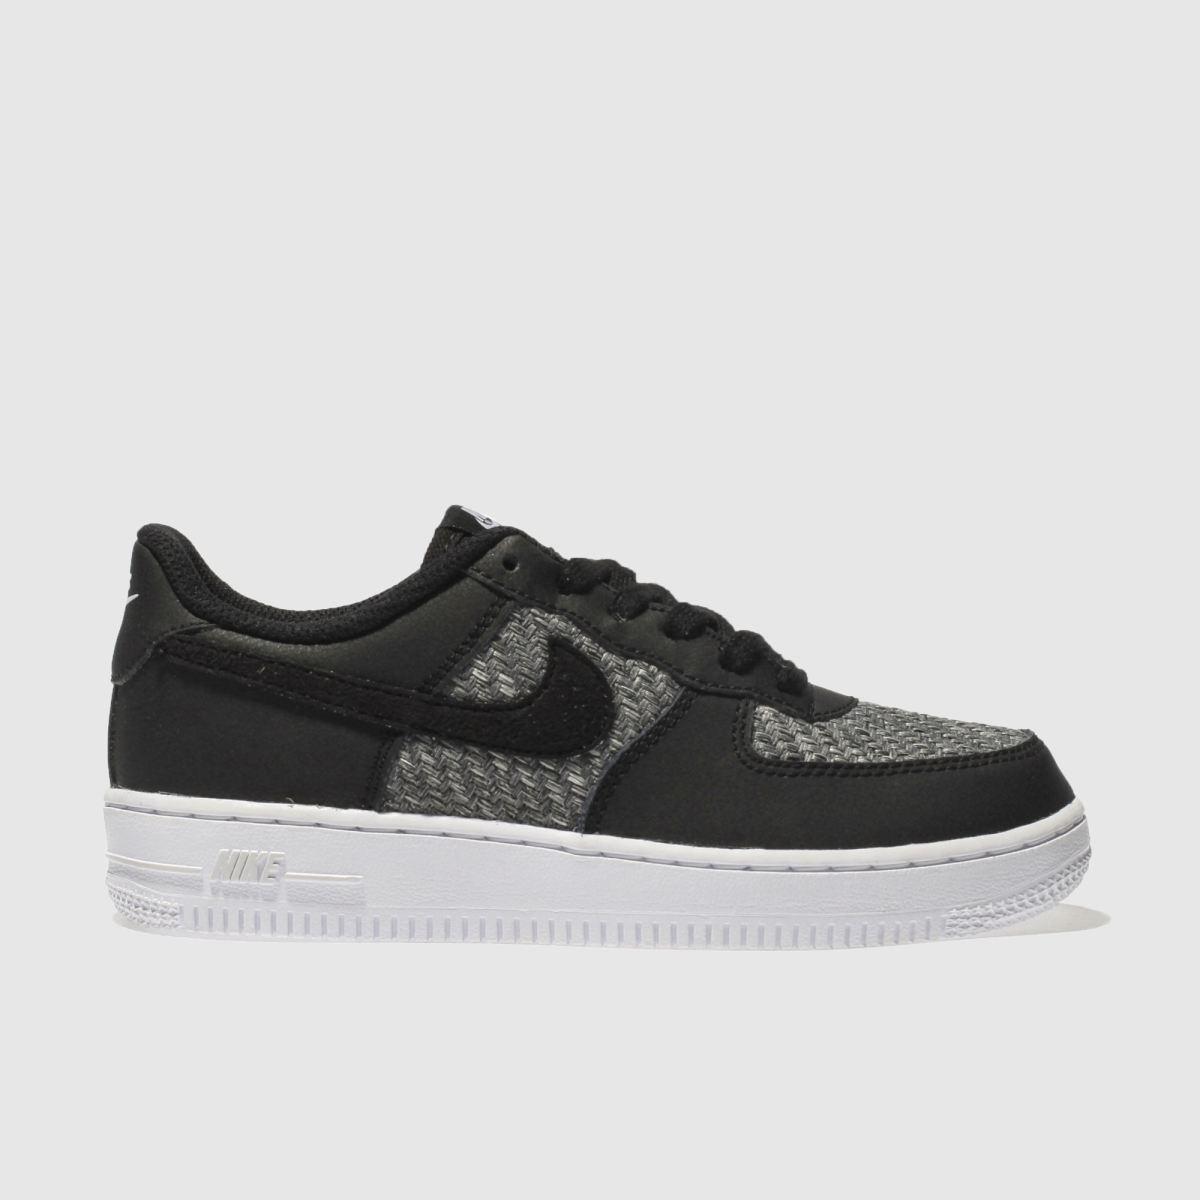 Nike Black & Grey Air Force 1 Boys Youth Youth